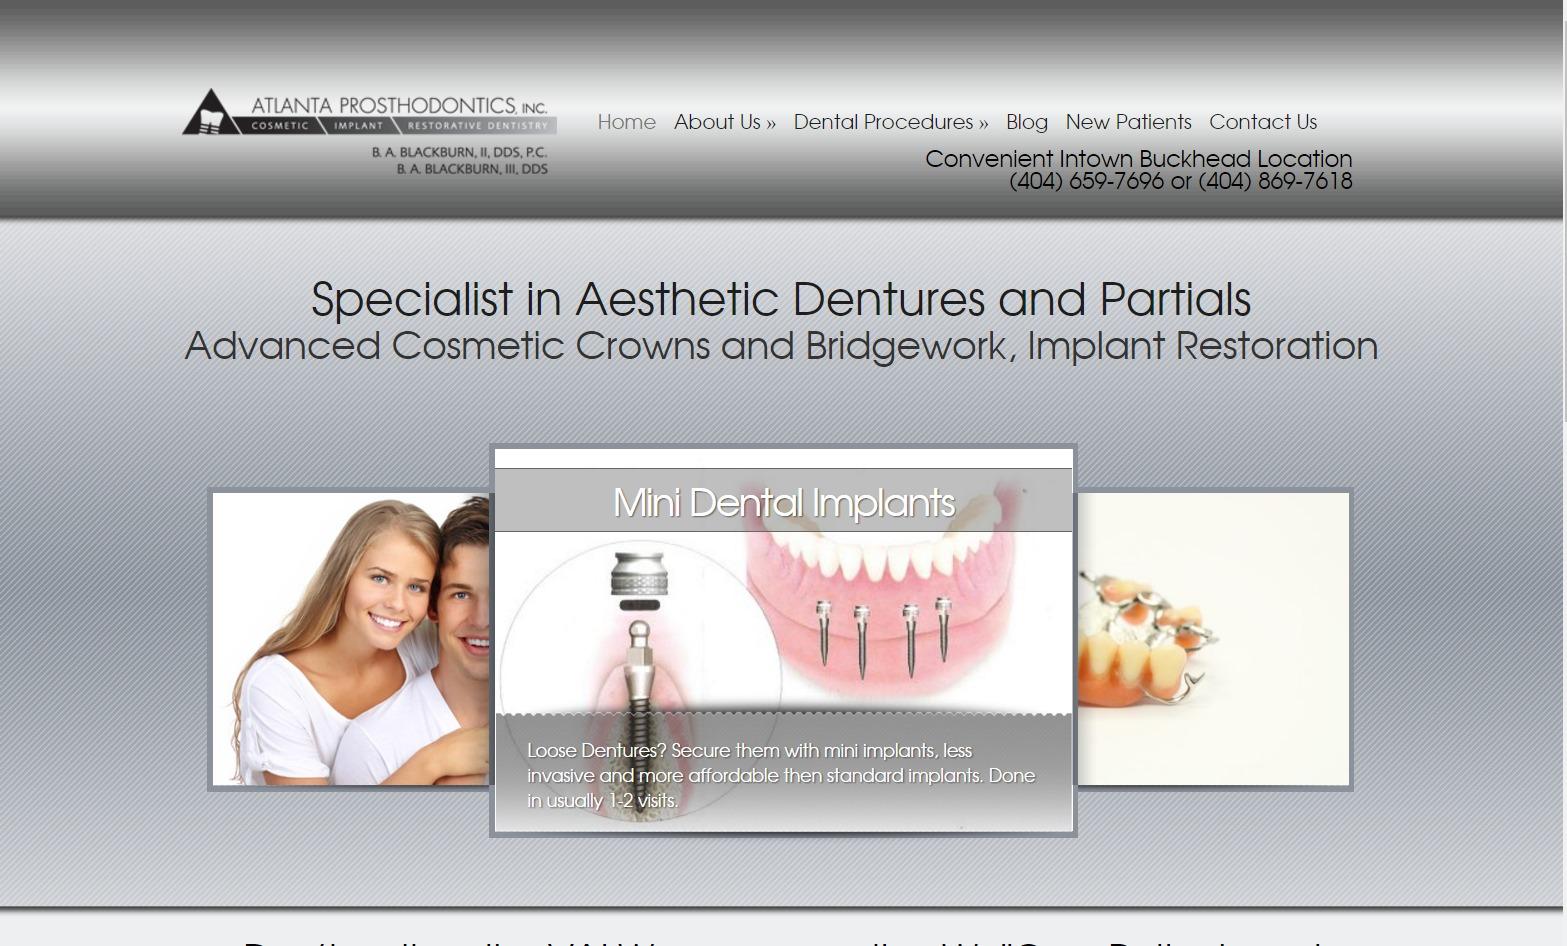 Atlanta Prosthodontics (Atlanta, GA) Web Design Project